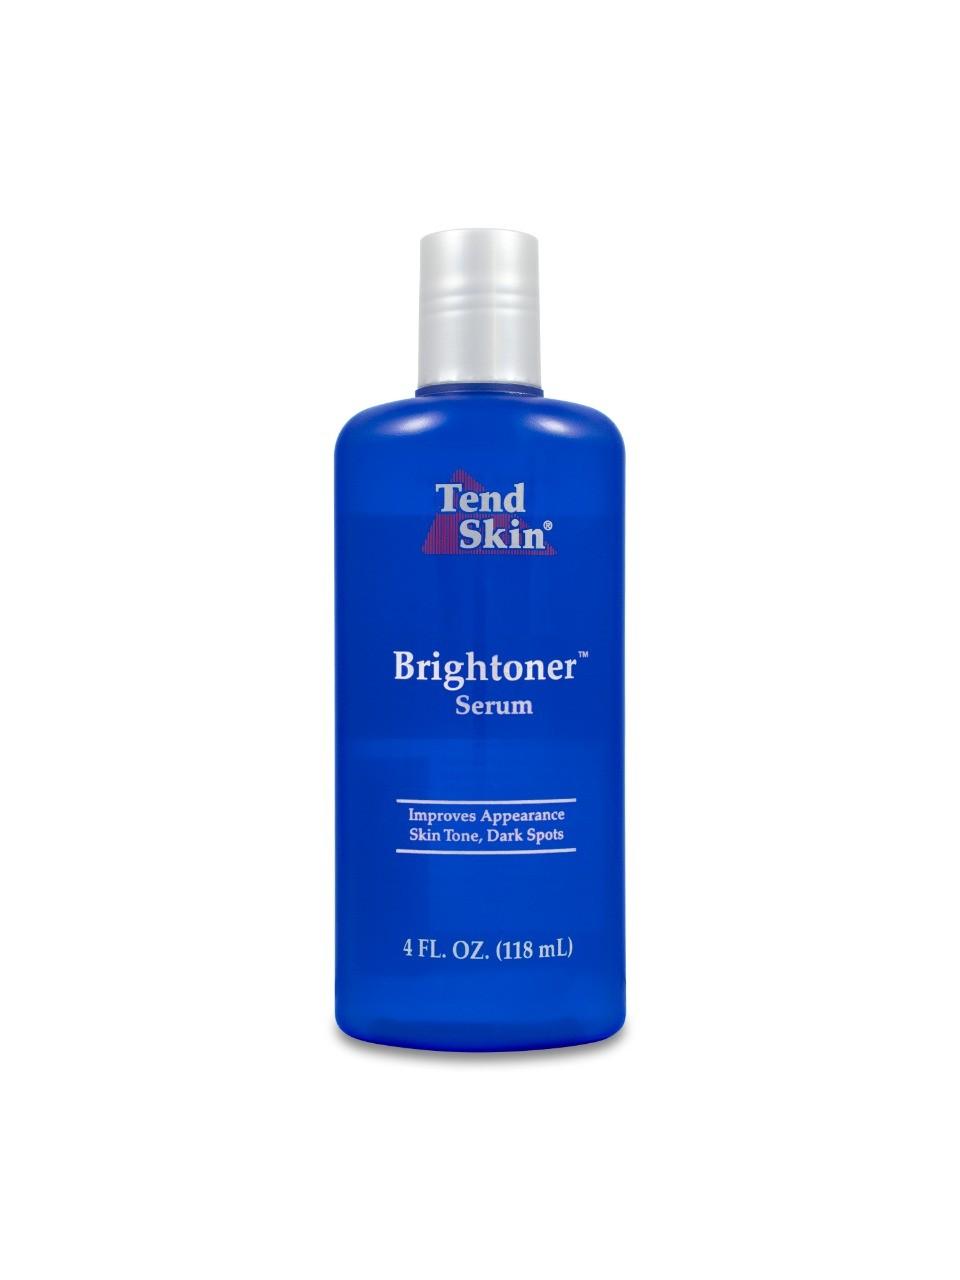 Tend Skin Brightoner Serum Clareador 118ML